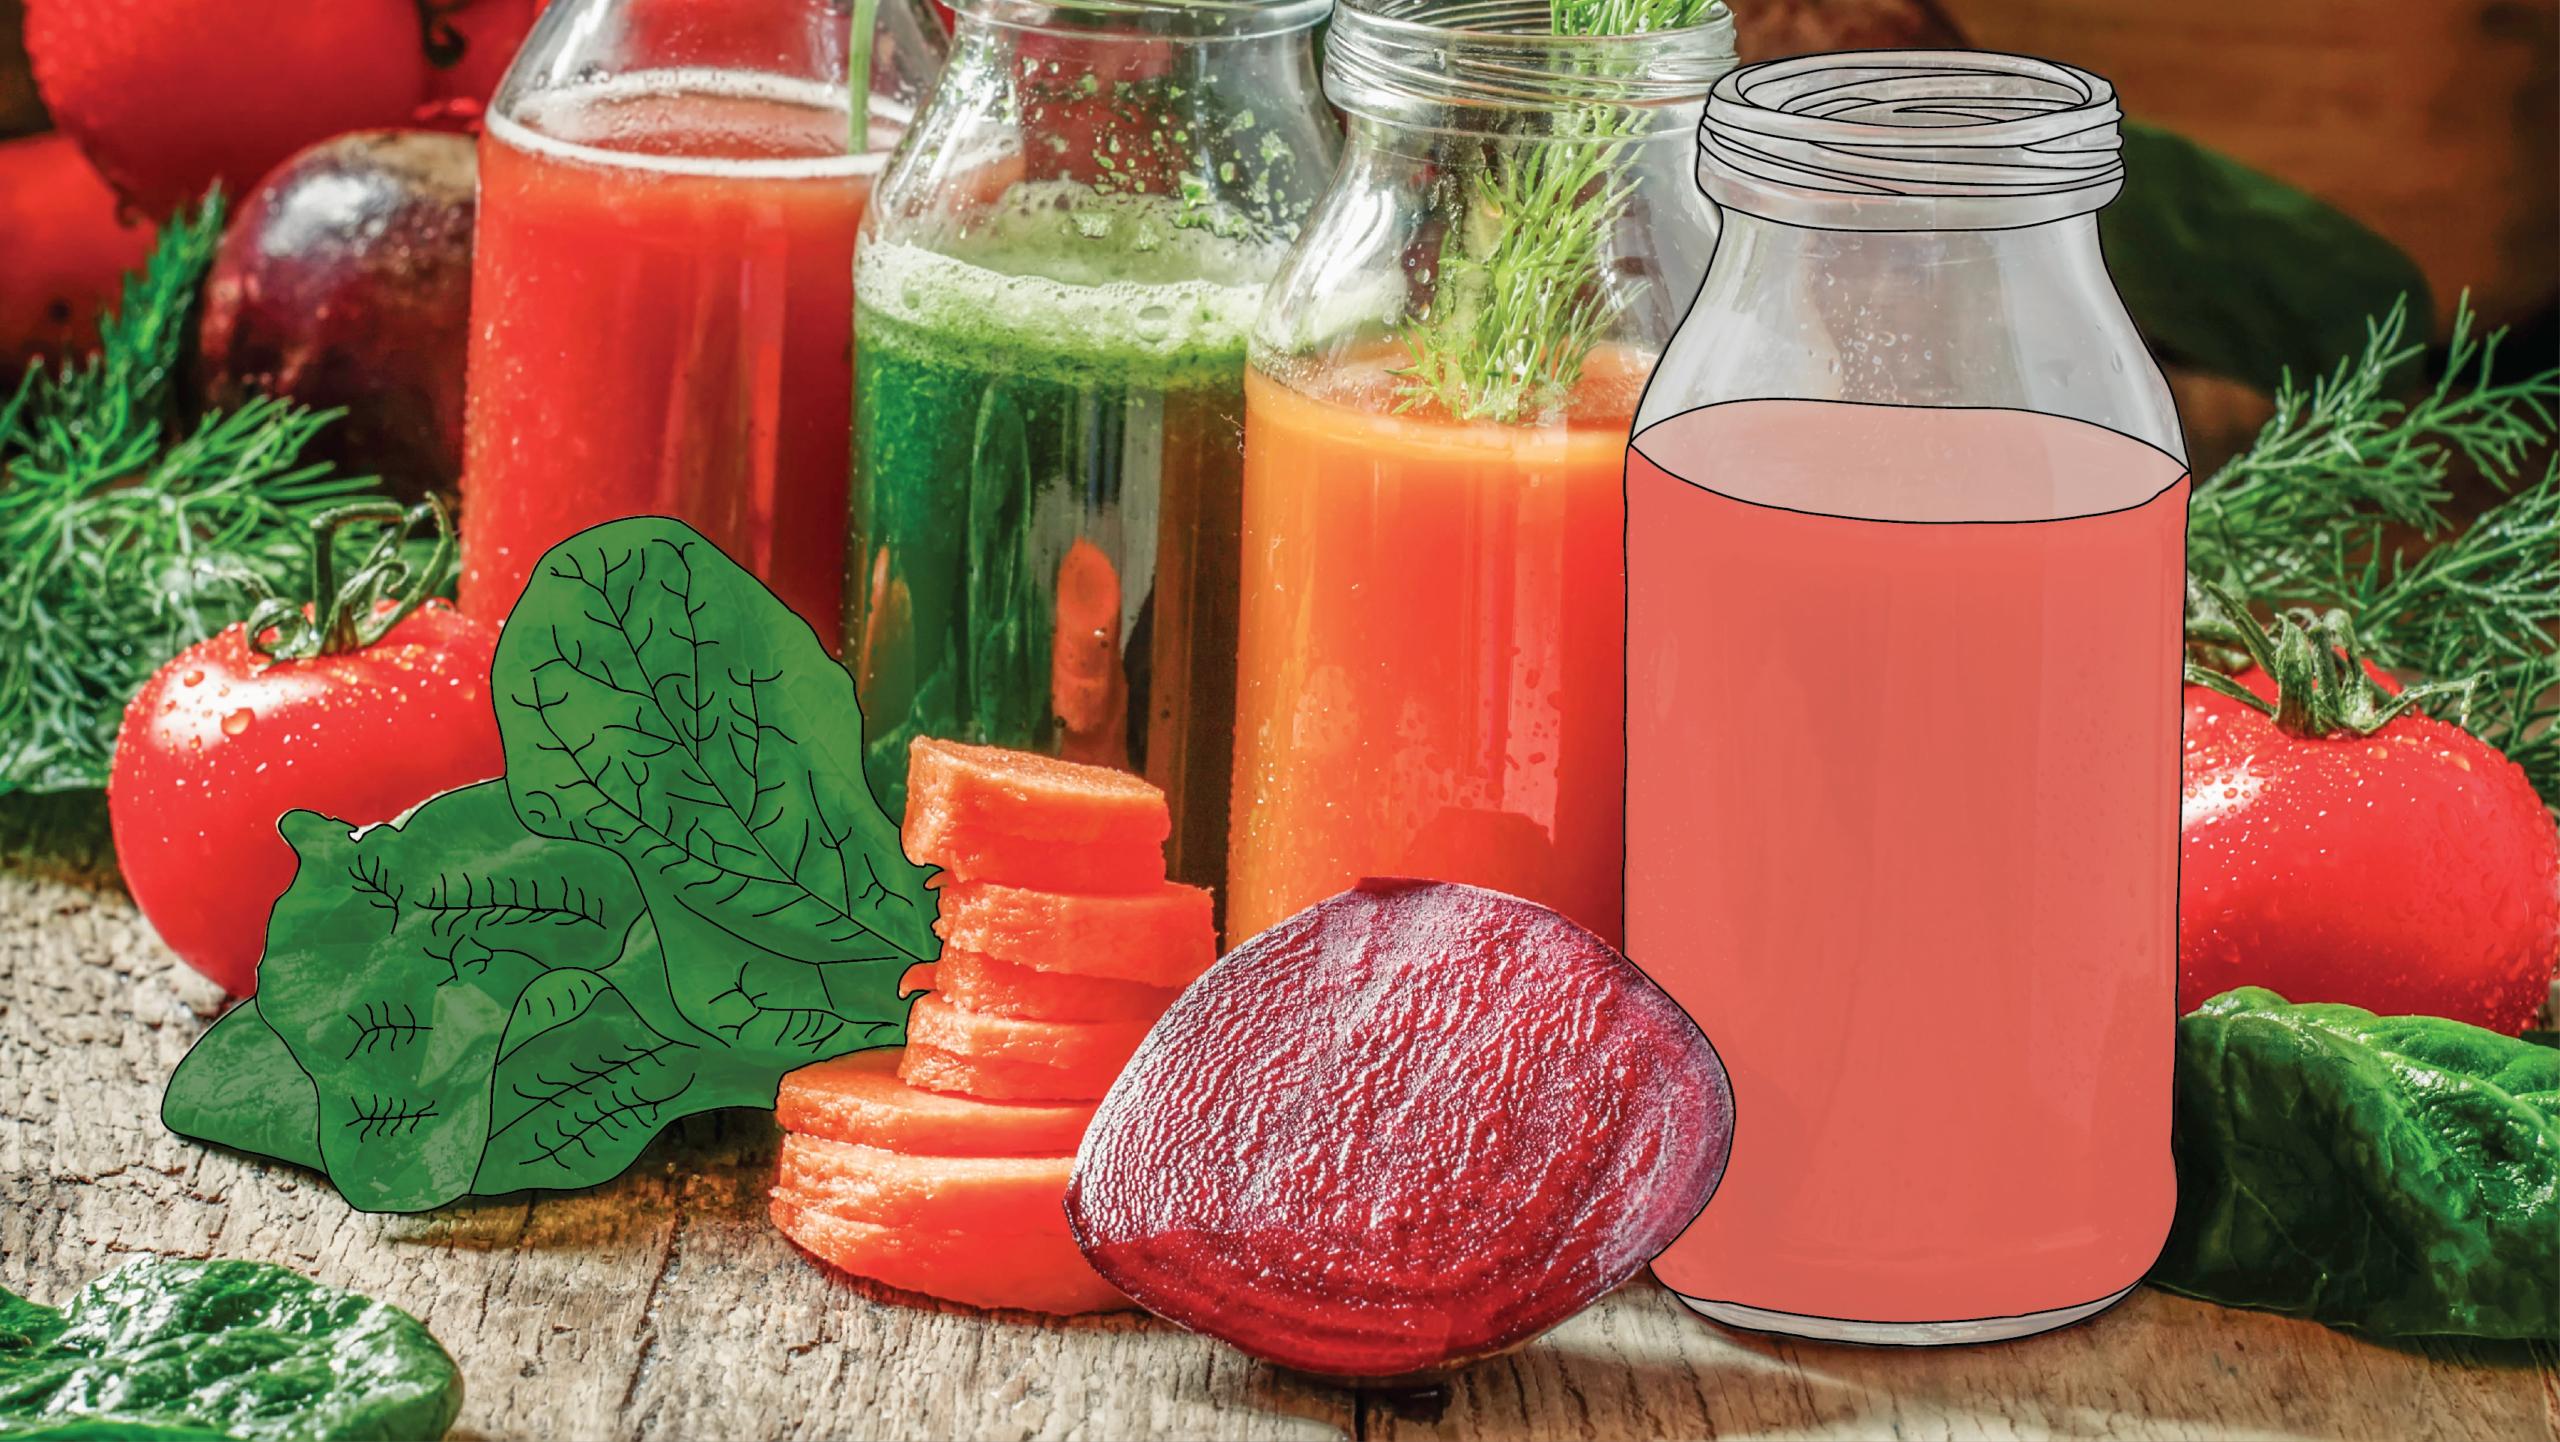 Assorted jars of vegetable juices